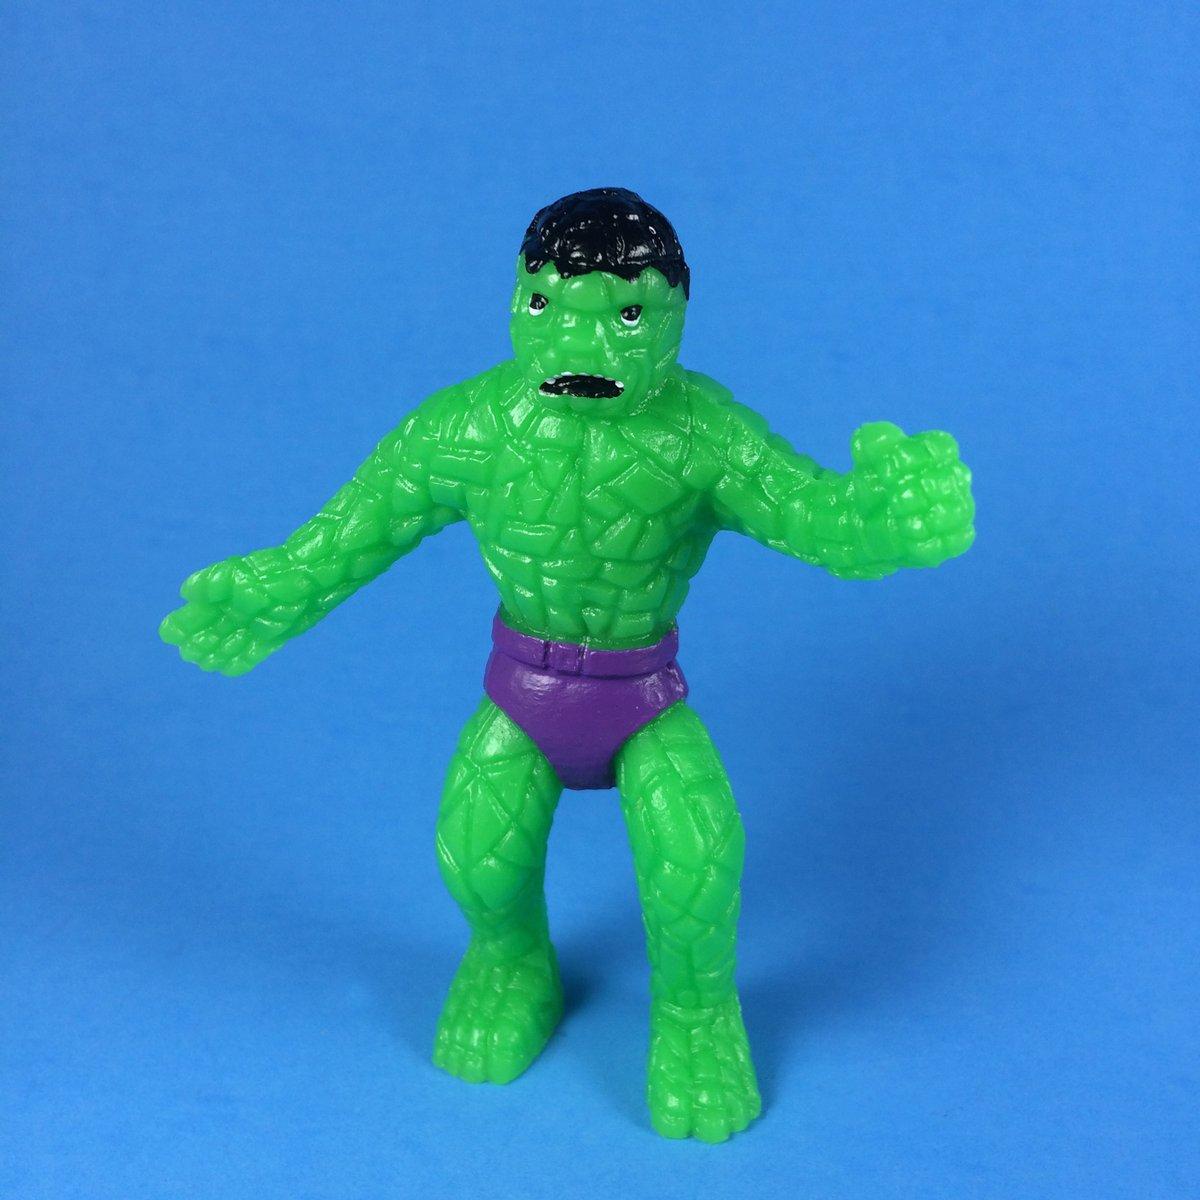 Image of The Hulk Thing bootleg art toy